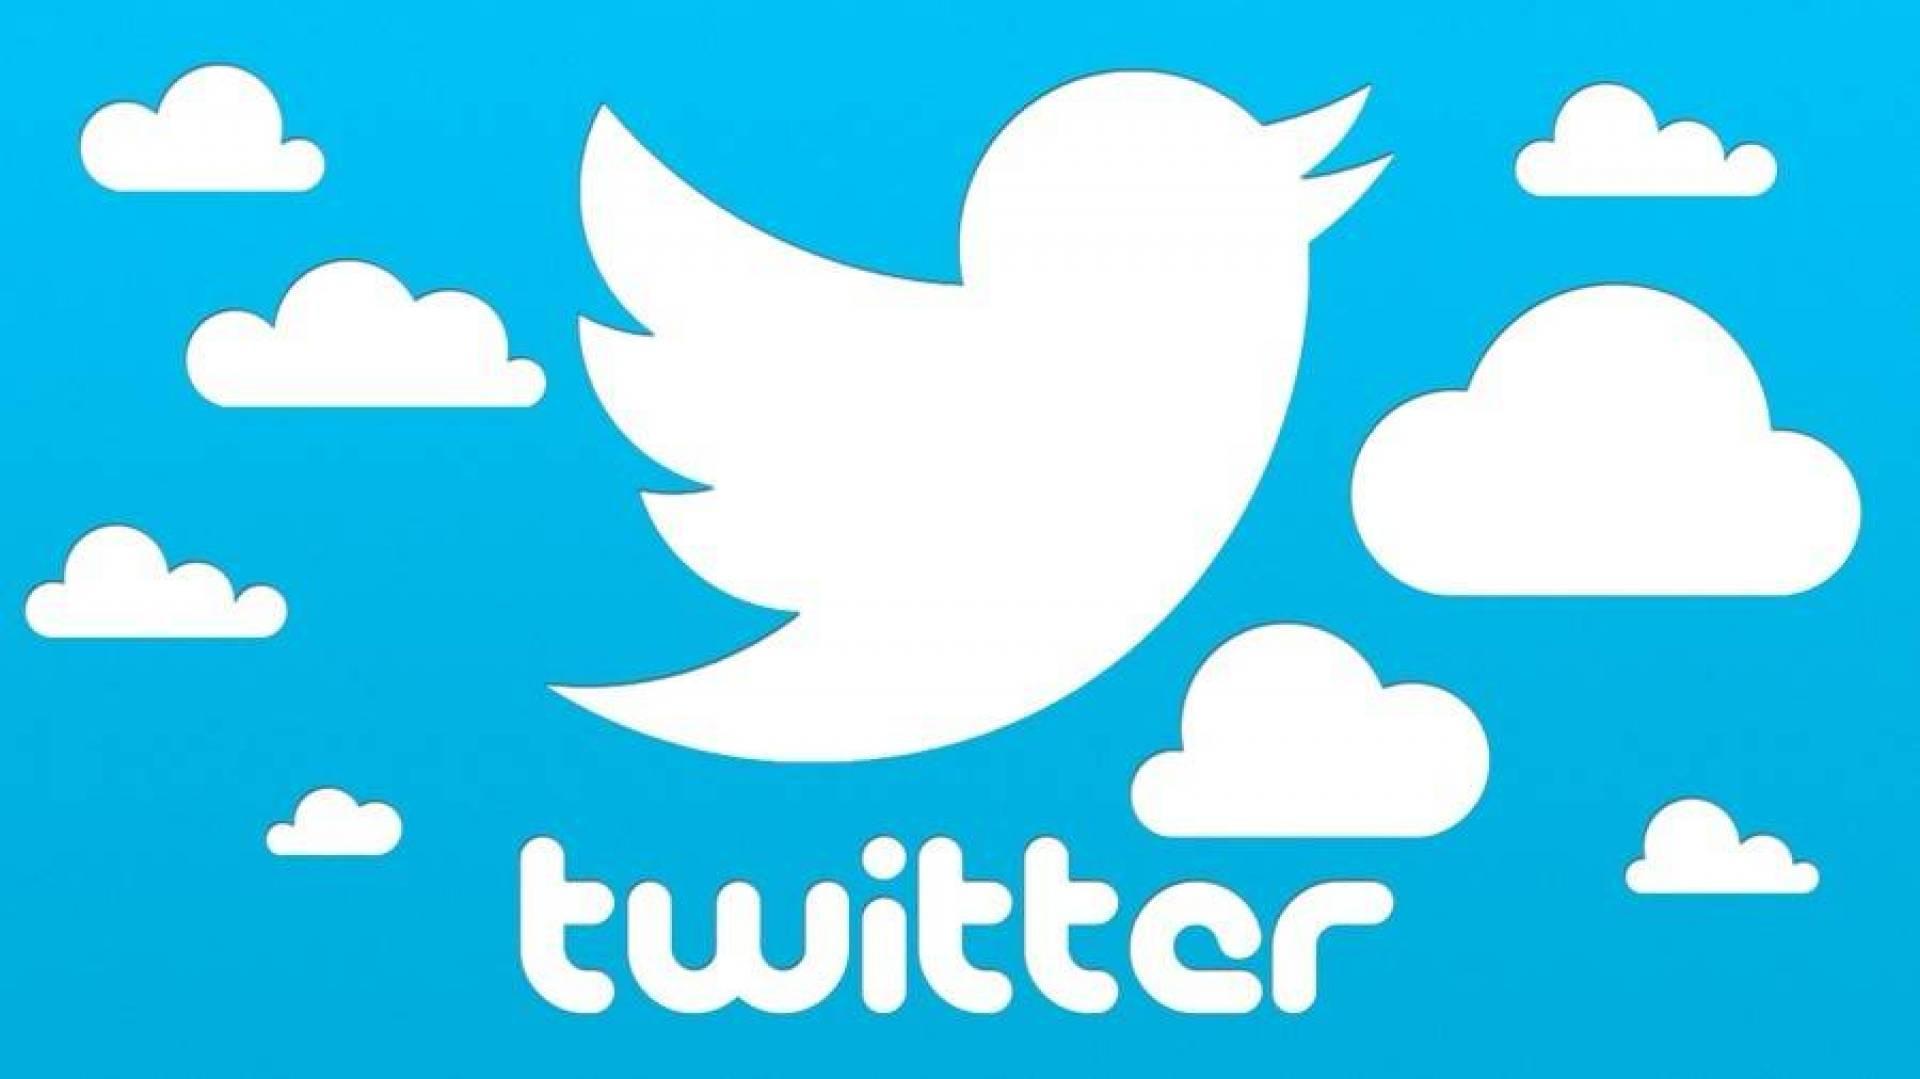 twitter 867525 highres - تطبيق تويتر يختبر ميزة جديدة بخصوص مشاركة وعرض الصور الحية تعرف عليها